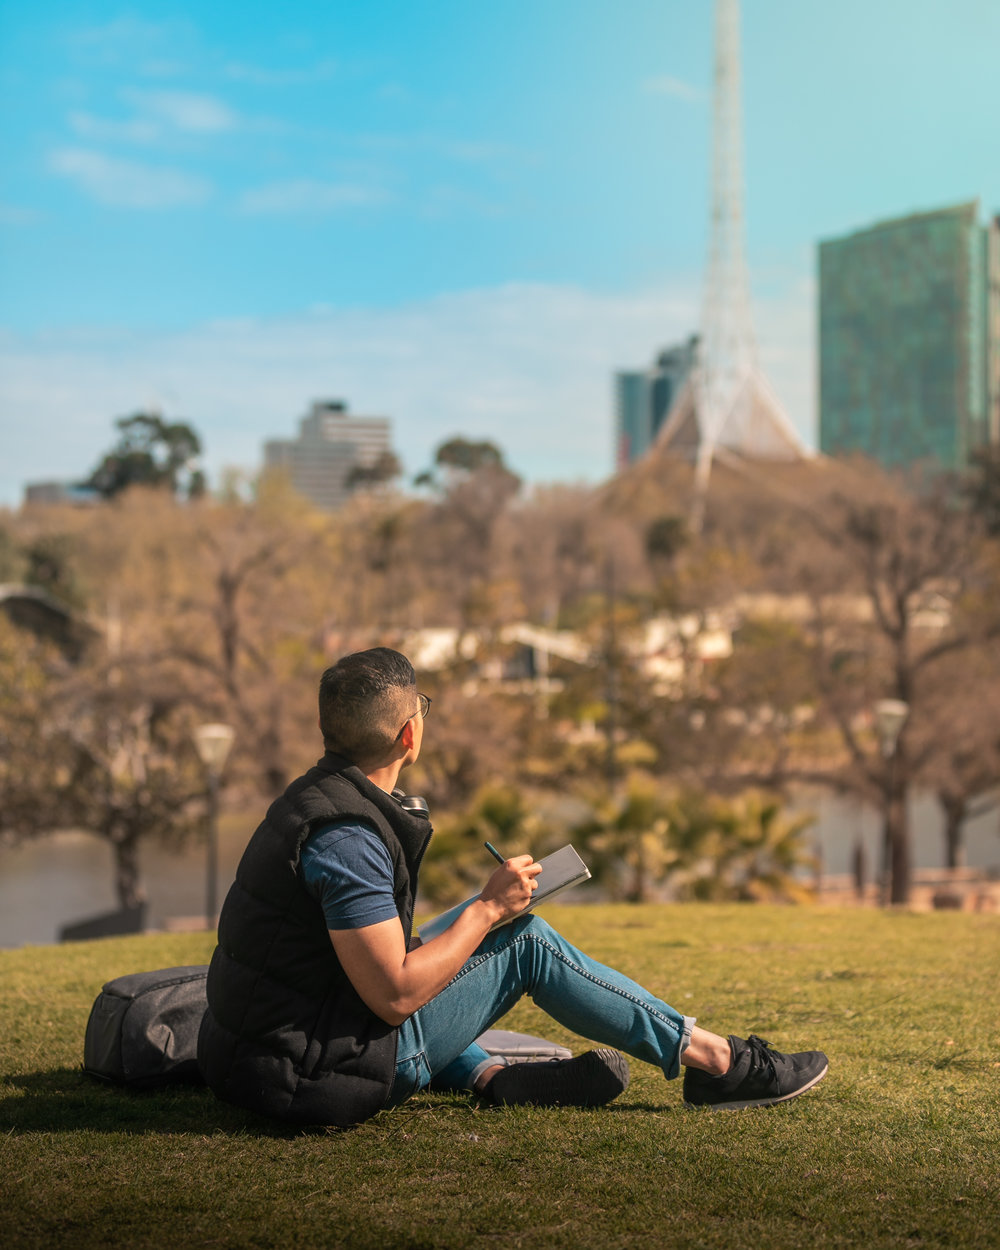 Dell + Qantas rewards program campaign